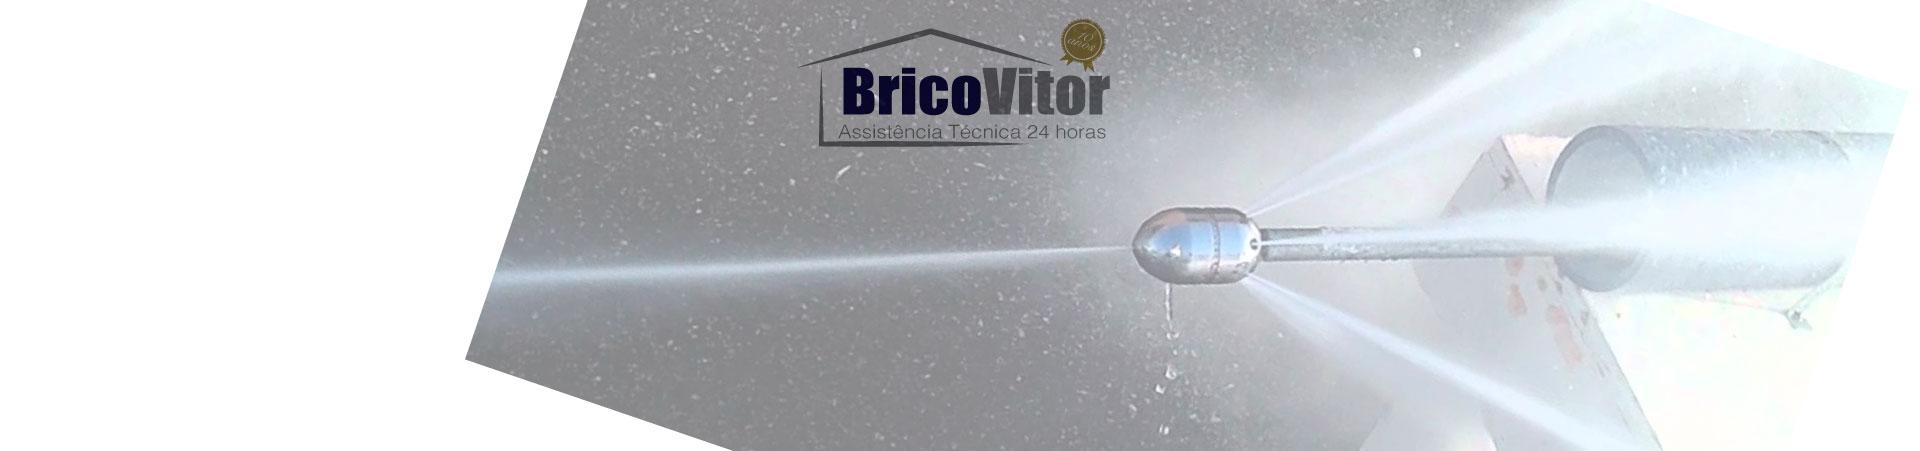 BricoVitor-Desentupimento-1 Desentupimentos Braga